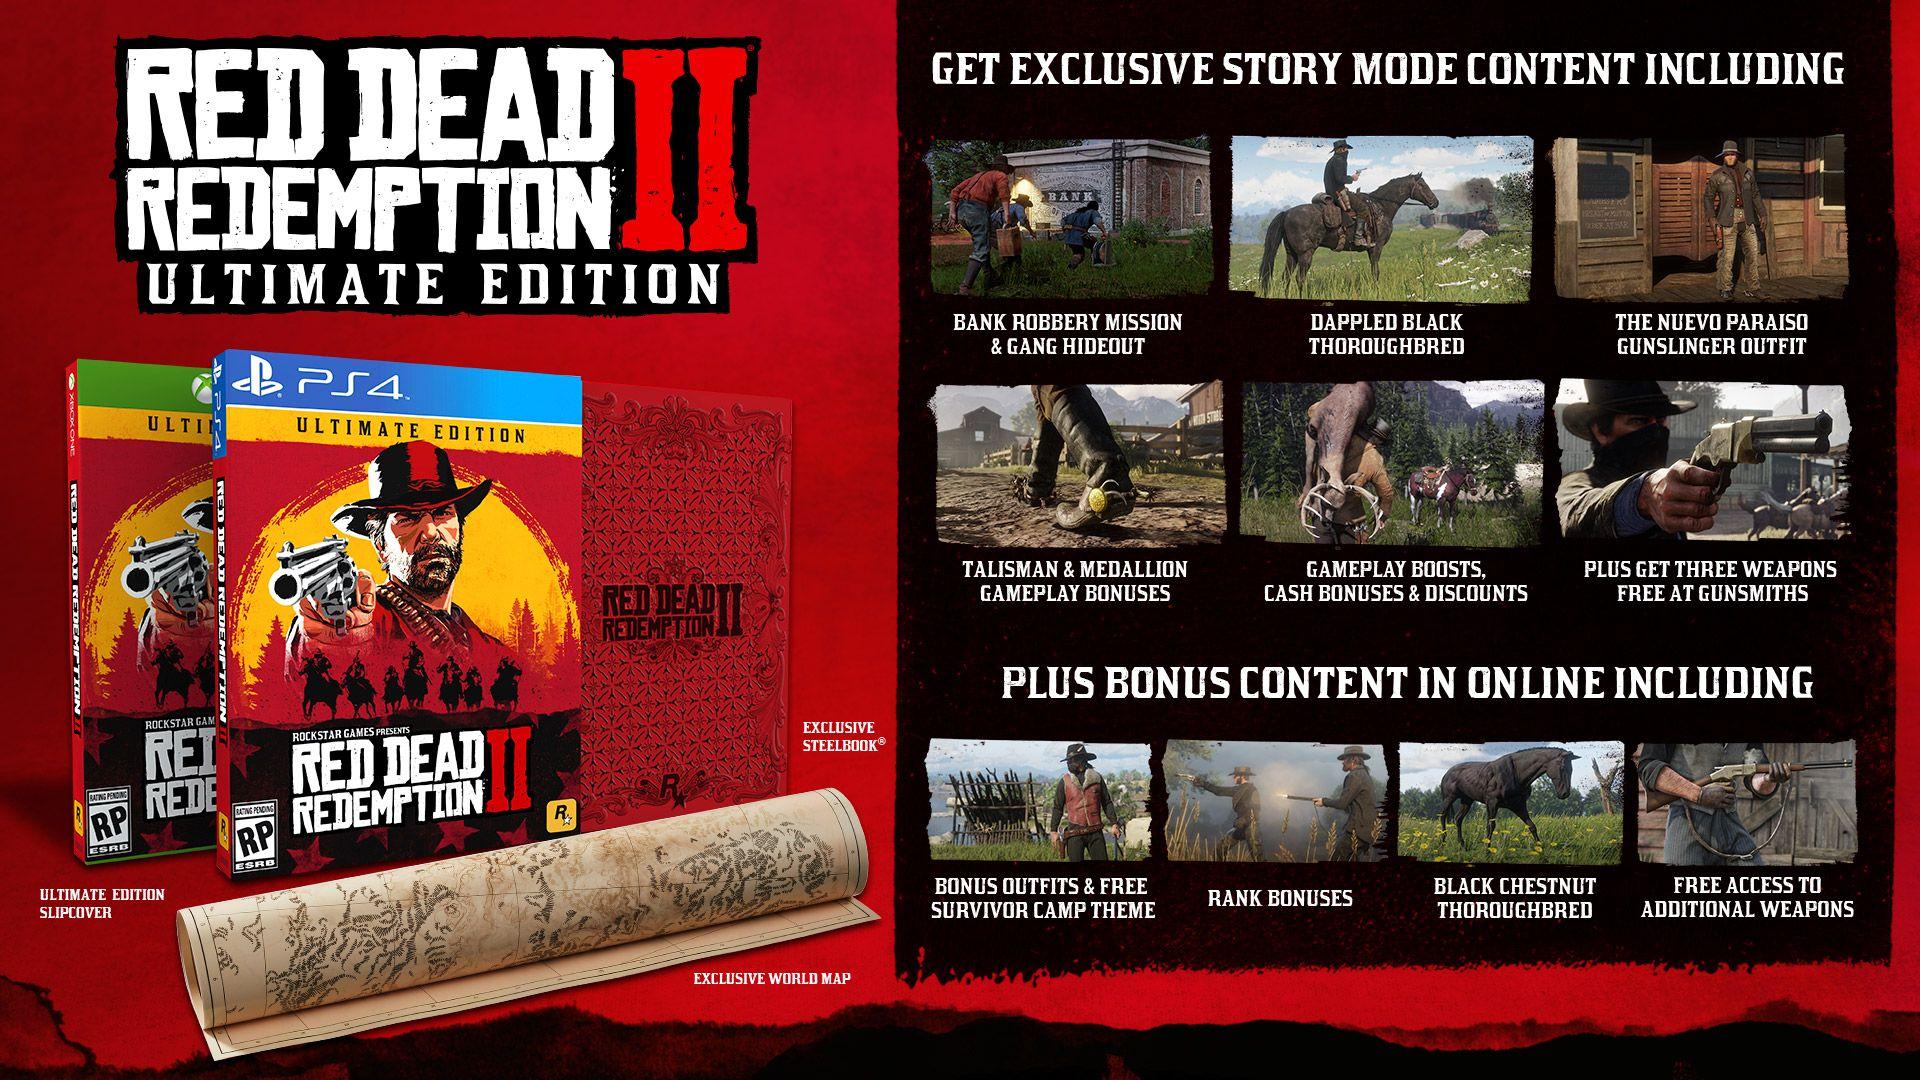 [netgames.de] Red Dead Redemption 2 Ultimate Edition Xbox One für 83,85 €